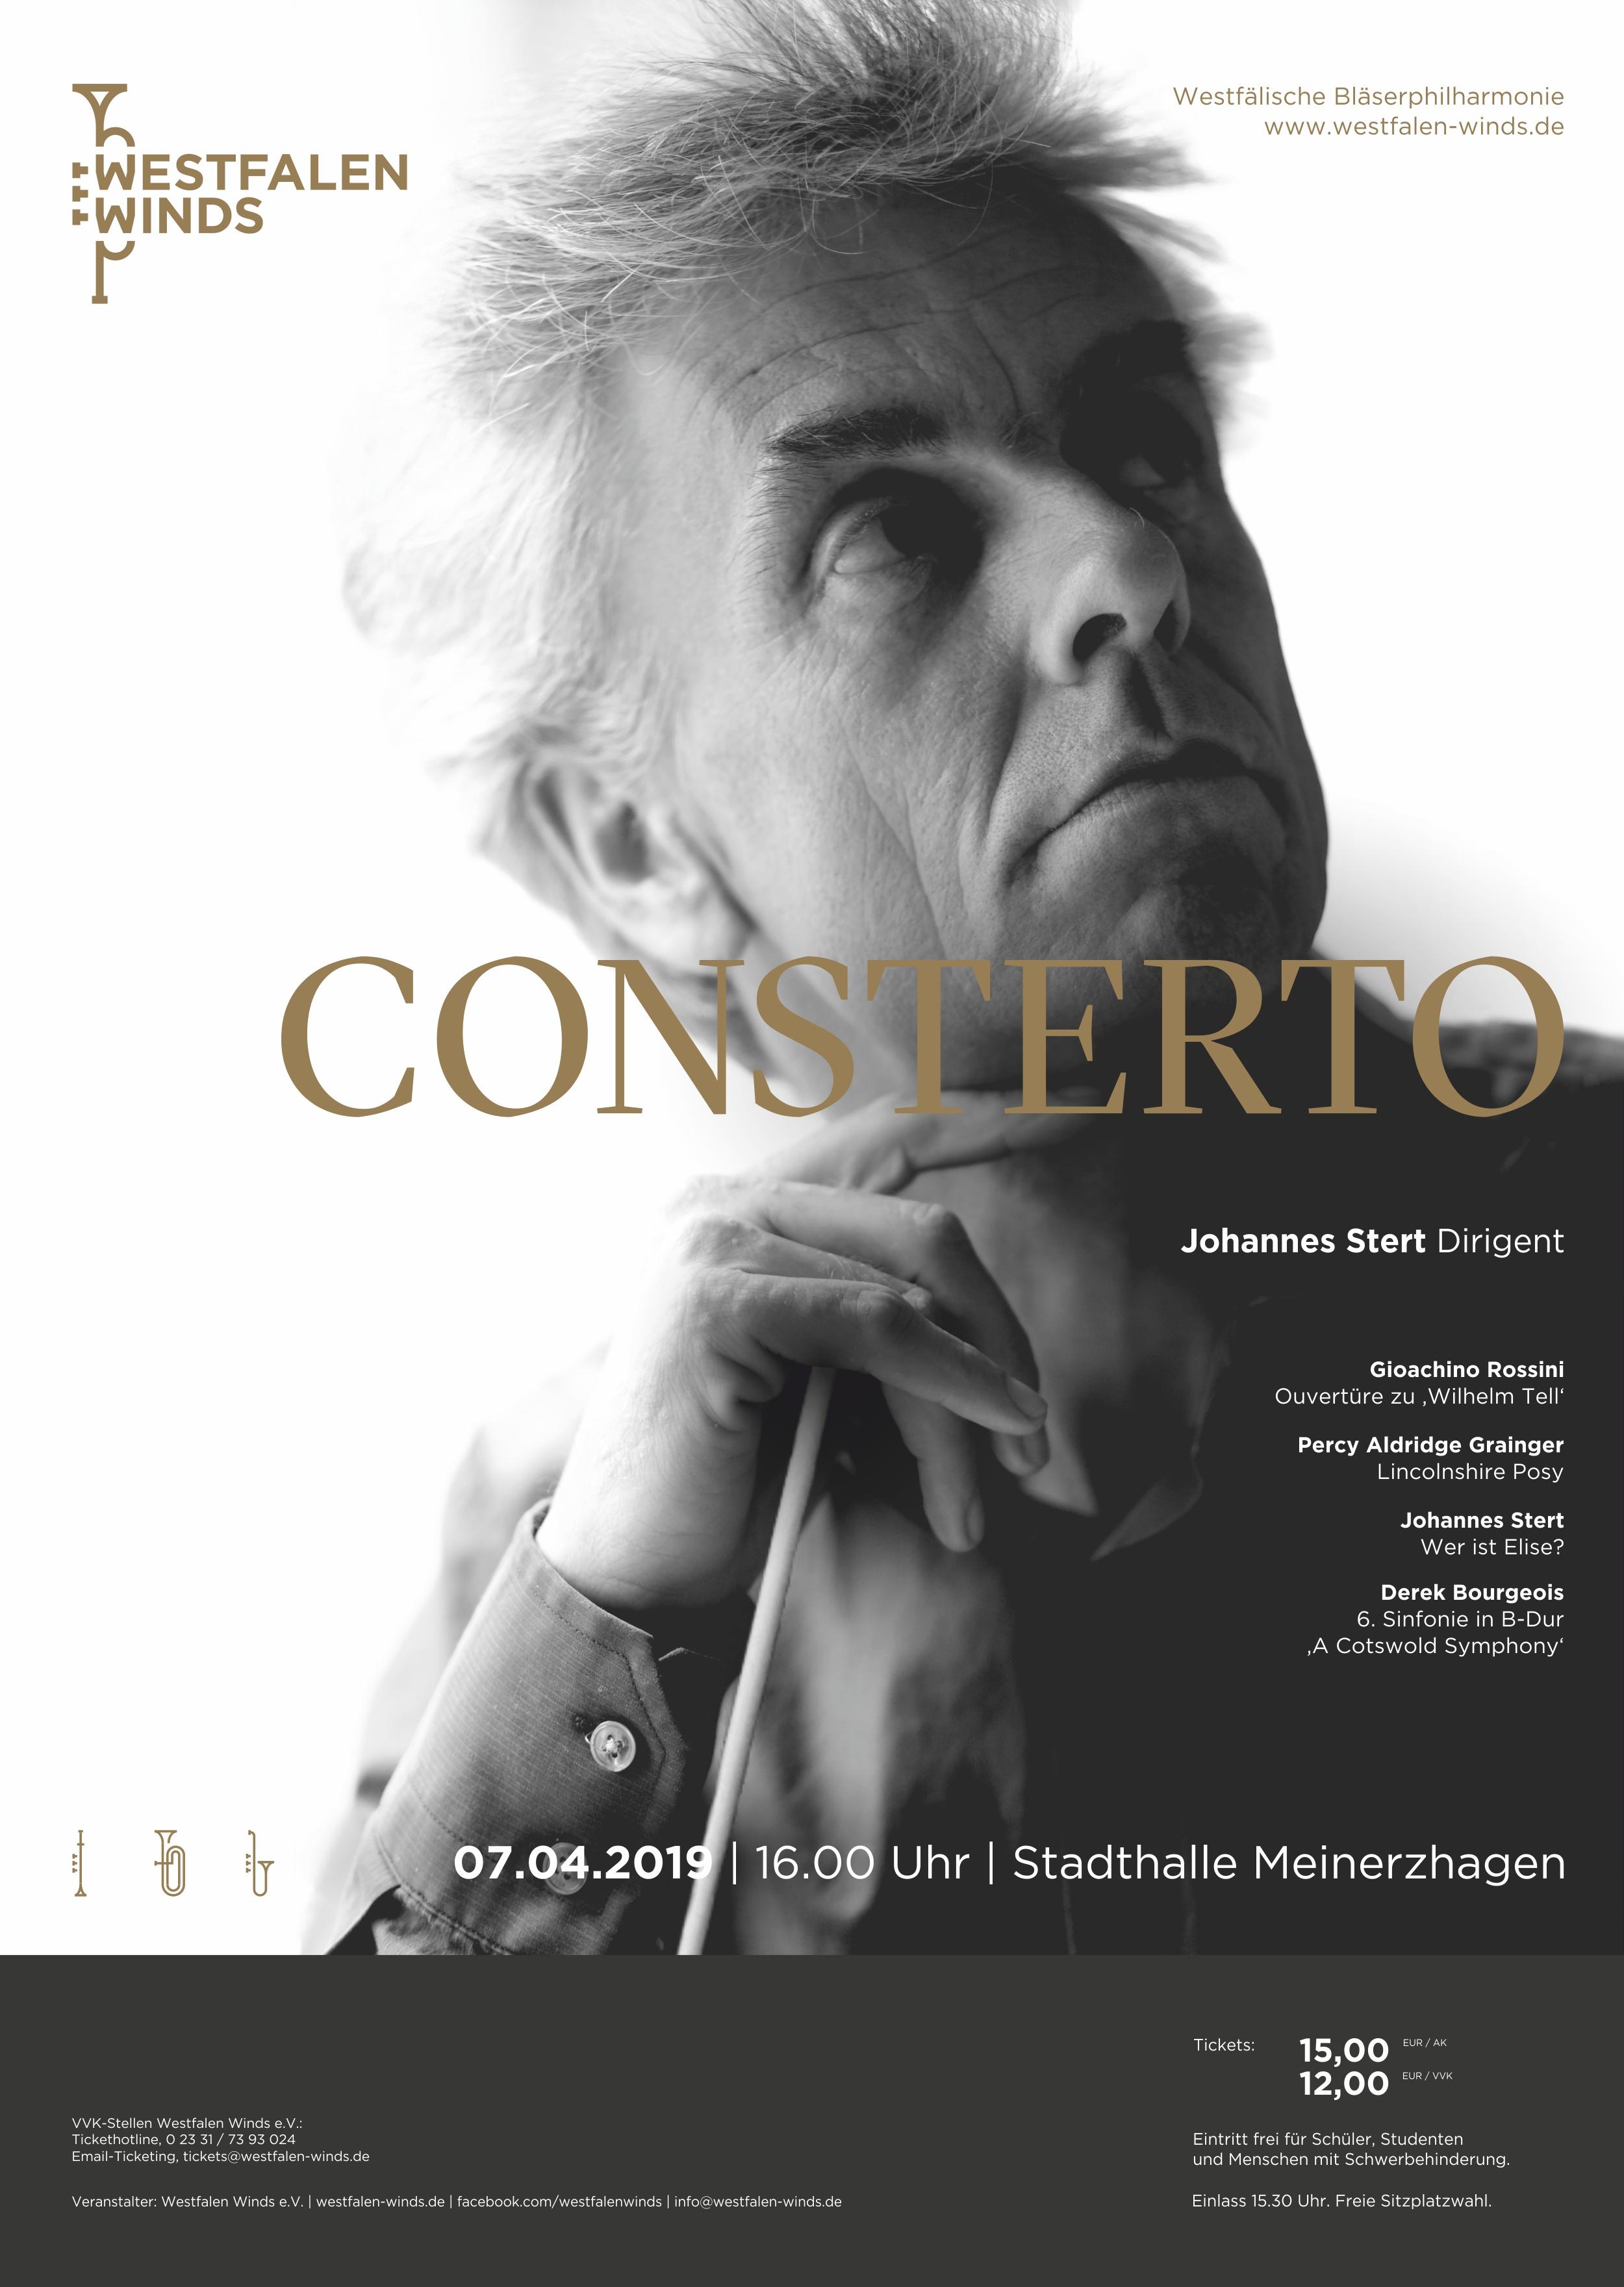 Bilddatei: Konzertplakat Frühjahr 2019 - Bild (c) Westfalen Winds e.V..jpg